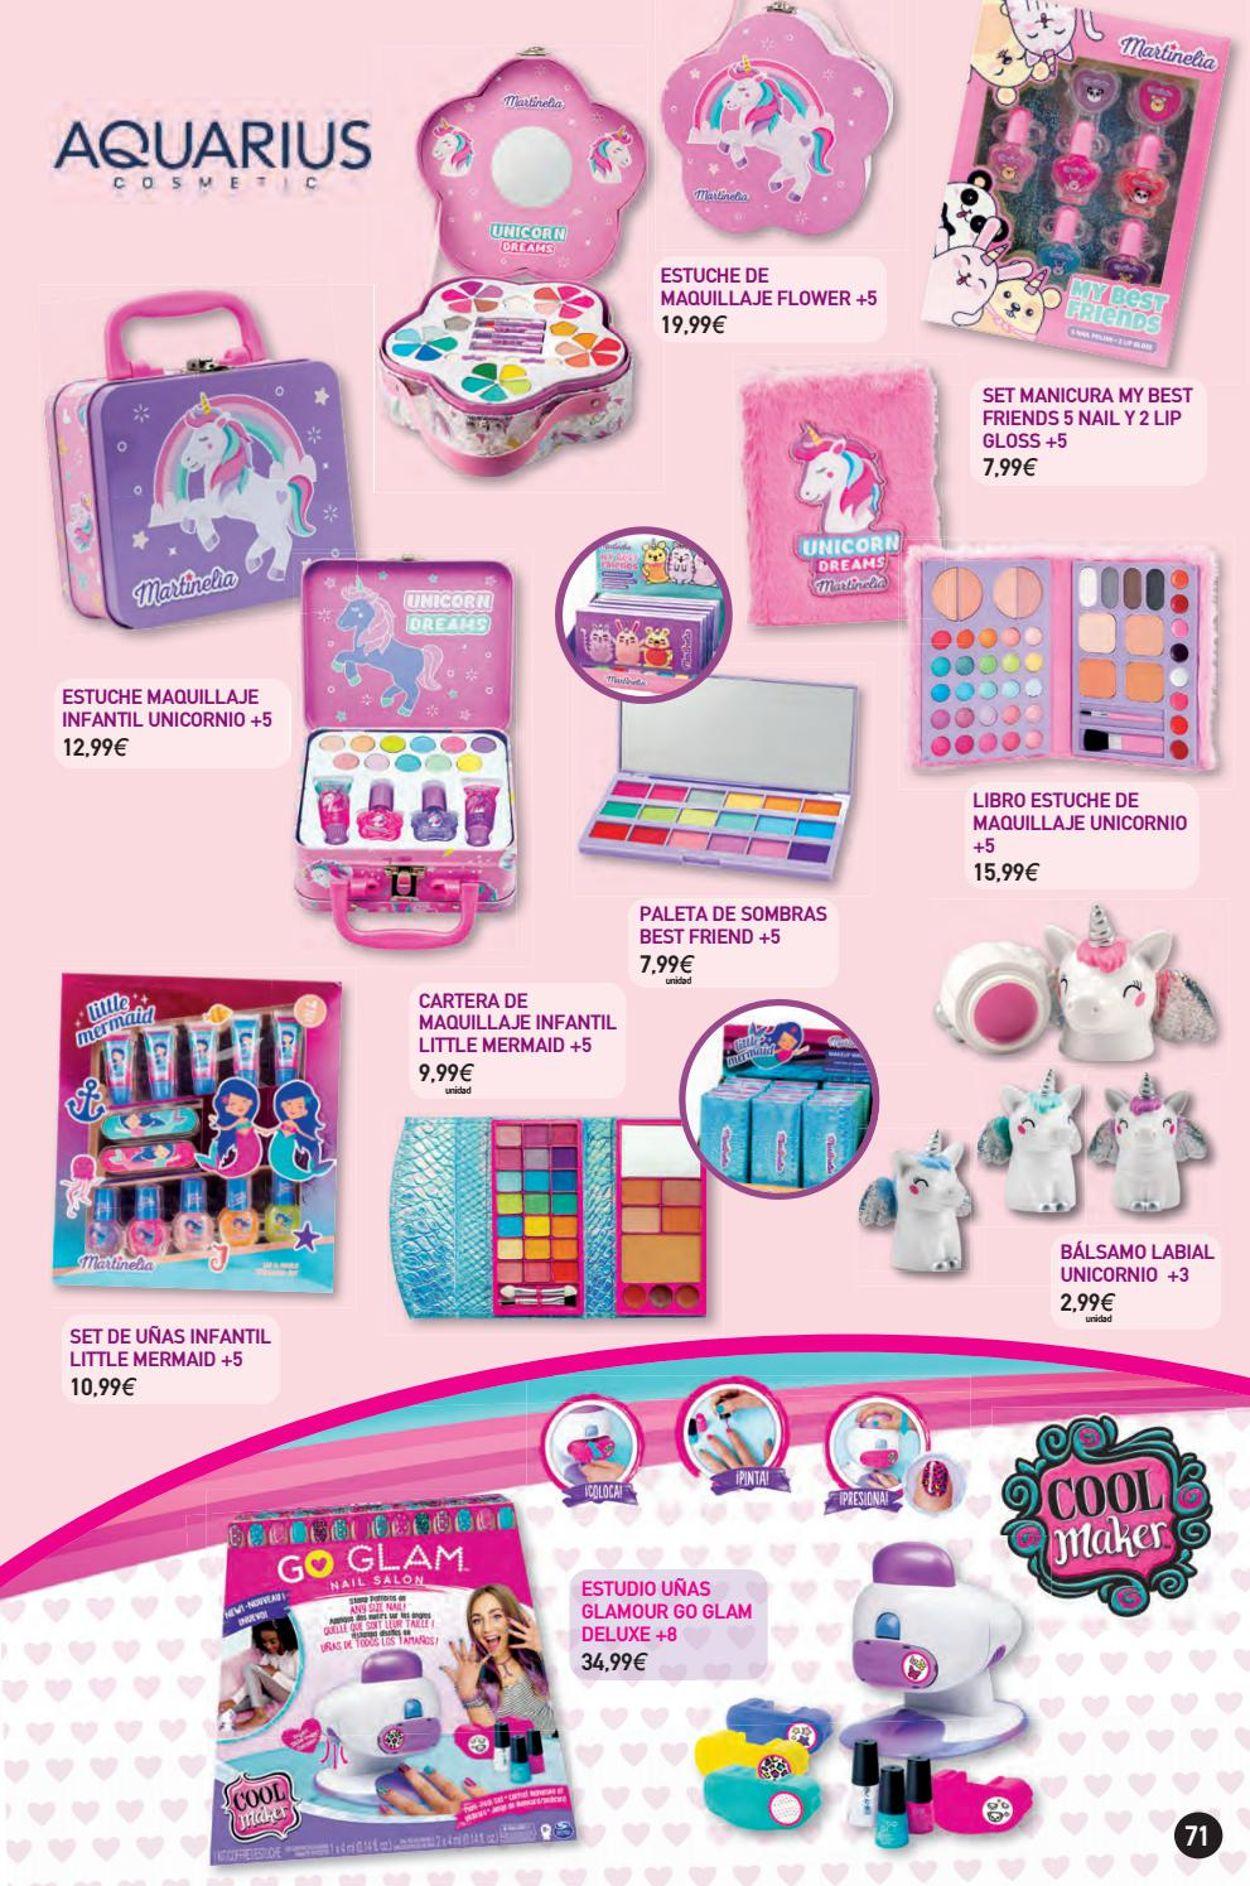 Toy Planet Folleto - 15.06-22.08.2021 (Página 71)